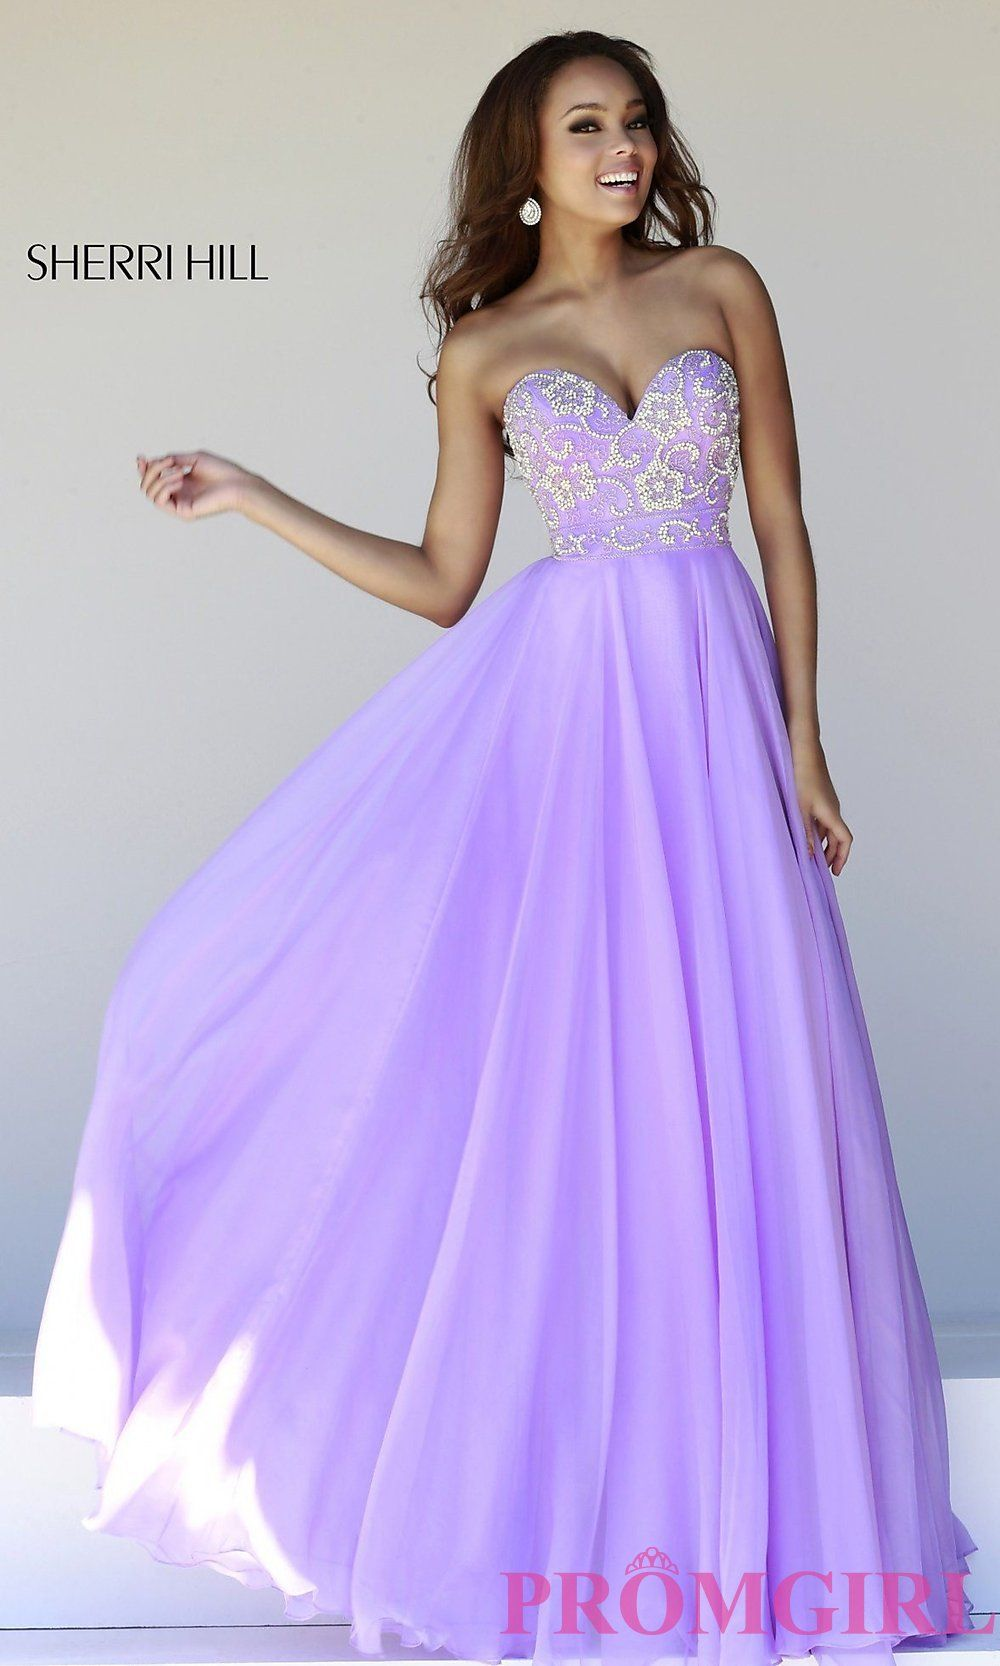 Long Prom Dress Style: SH-8545 Front Image | Dresses | Pinterest